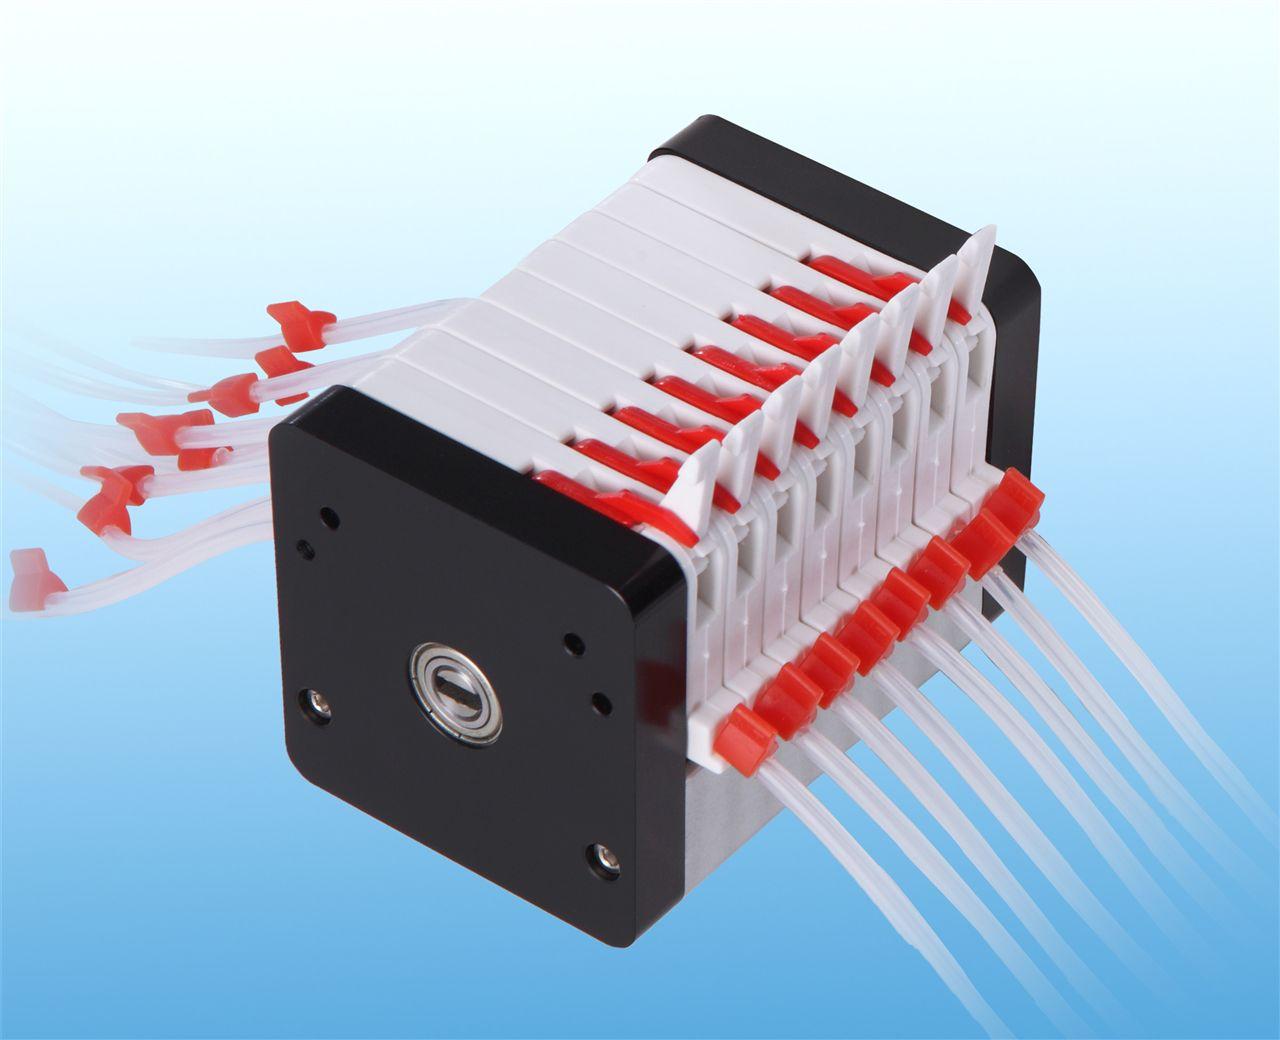 MC4X系列泵头用于微小流量、高精度、多通道液体传输。内置4个滚轮,按通道数目可分为1-6、8、12通道,并且可以通过泵头串联组合成任意通道数目。(纳通MC8X系列泵头内置8个滚轮,属于高精密传输类泵头,详情请查看MC8X系列产品介绍) MC4X系列泵头以其独特的优势(全轴承设计),广泛用于各种分析仪器配套、实验室研发、制药、化工行业、食品行业、油漆涂料行业、医药行业、水处理行业、石油行业、造纸行业、采矿、冶金行业、陶瓷行业等。